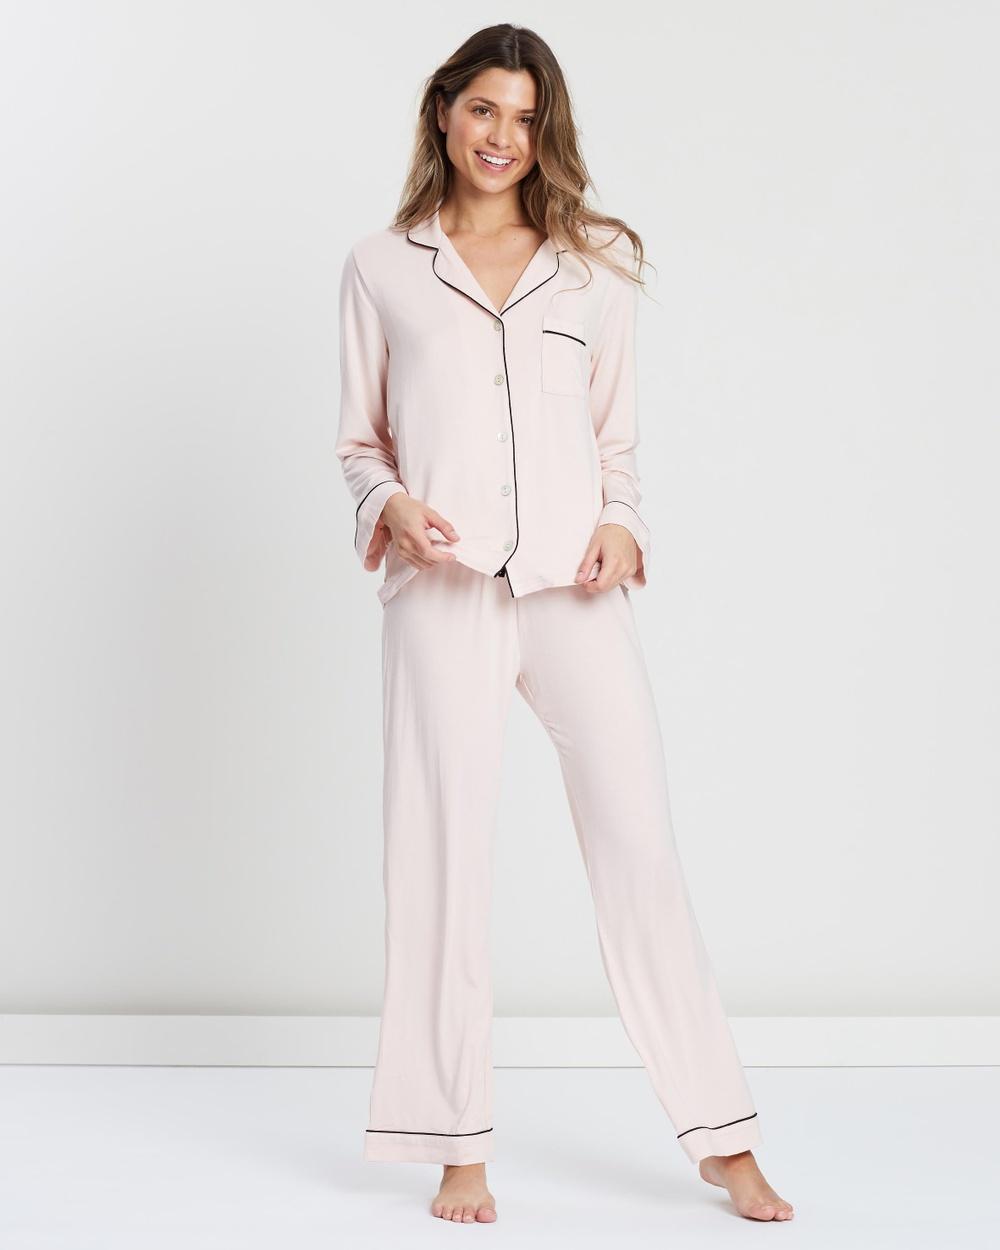 Homebodii Petra Long Piping PJ Set Underwear & Sleepwear Blush